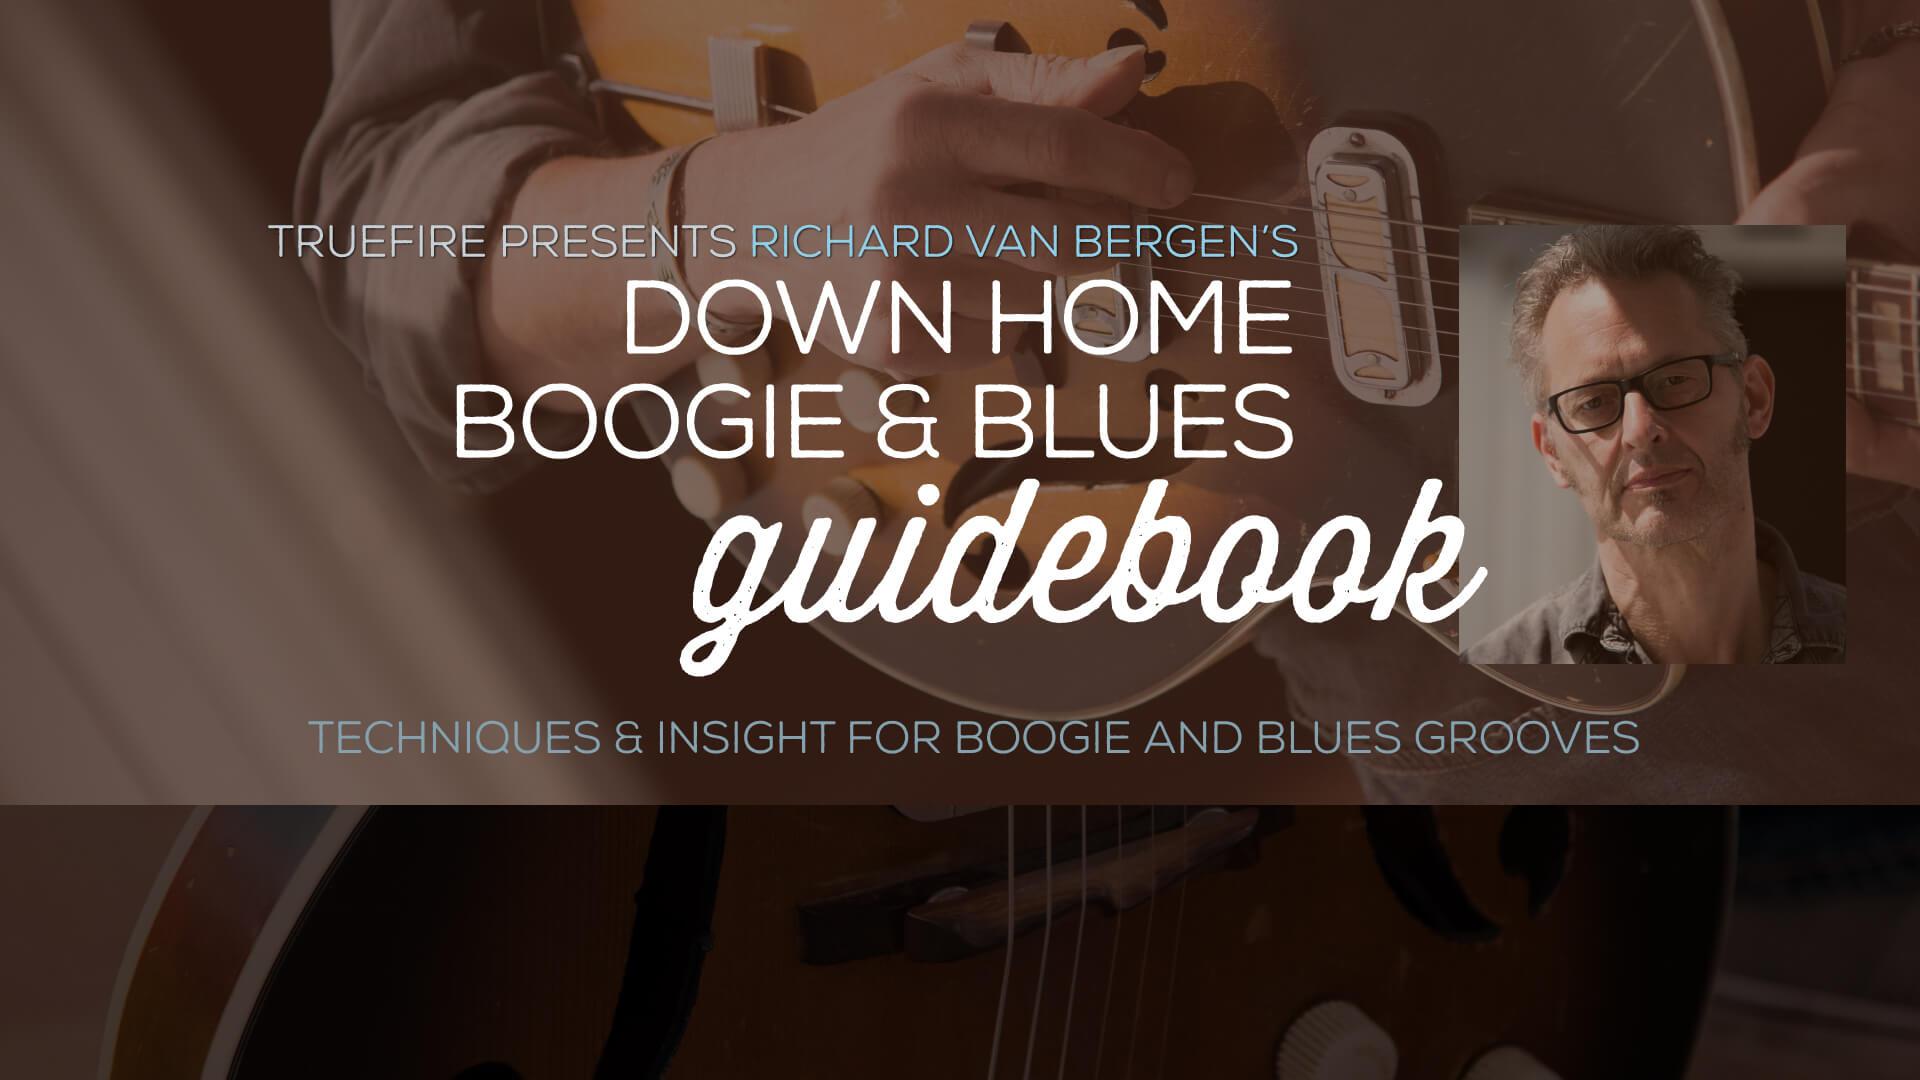 Down Home Boogie Blues Guidebook Guitar Lessons Richard Van